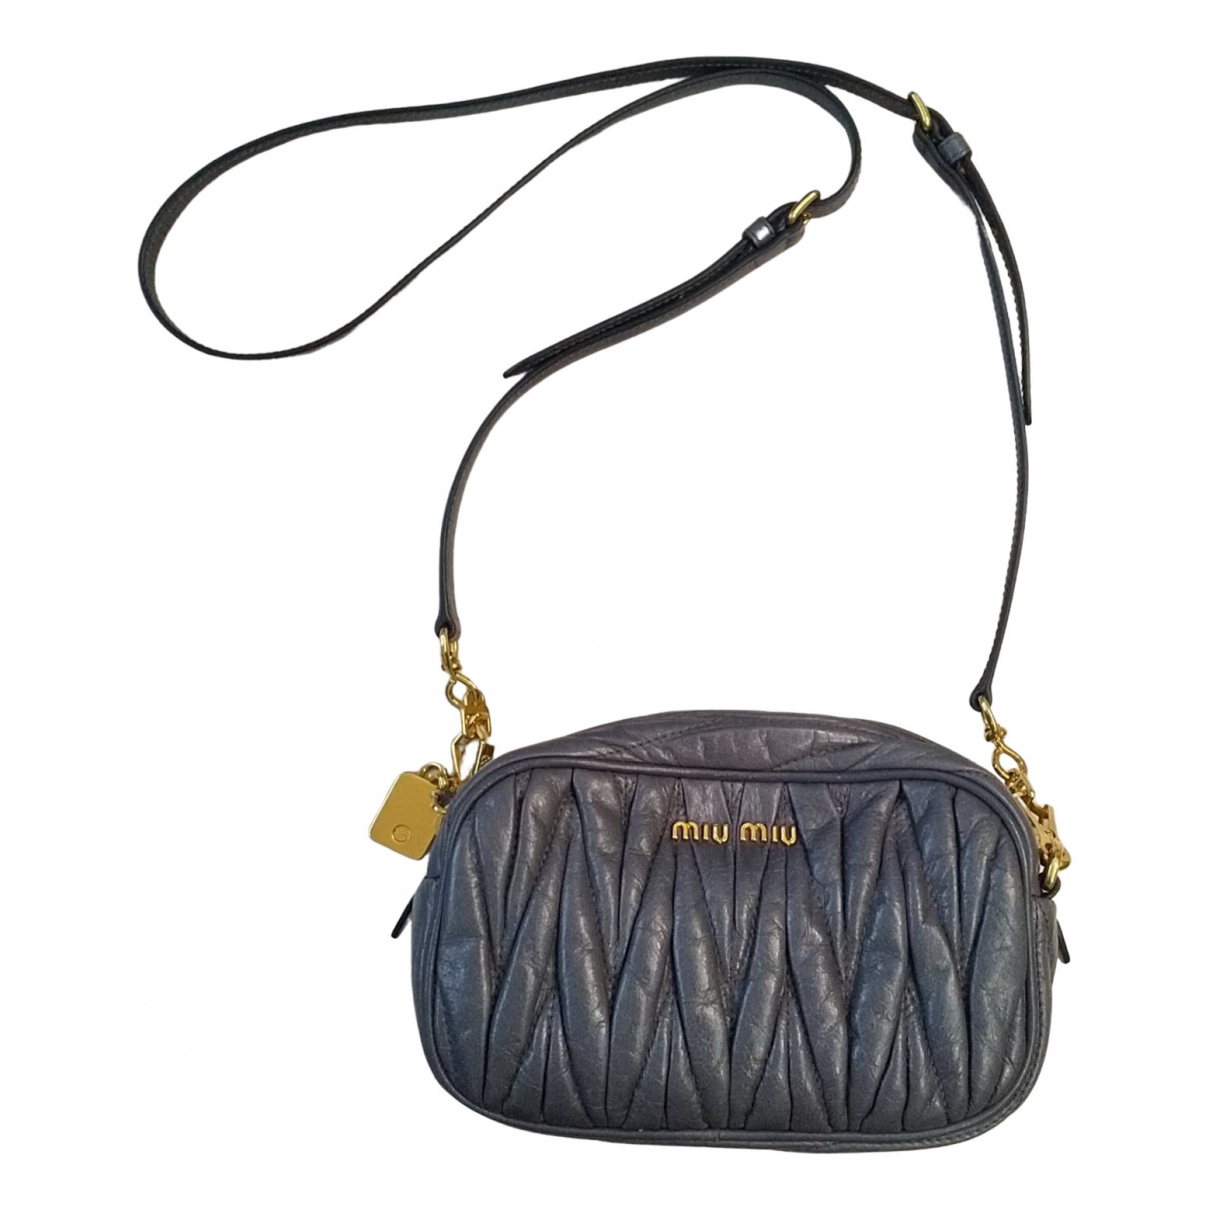 Miu Miu Matelasse Handtasche in Leder